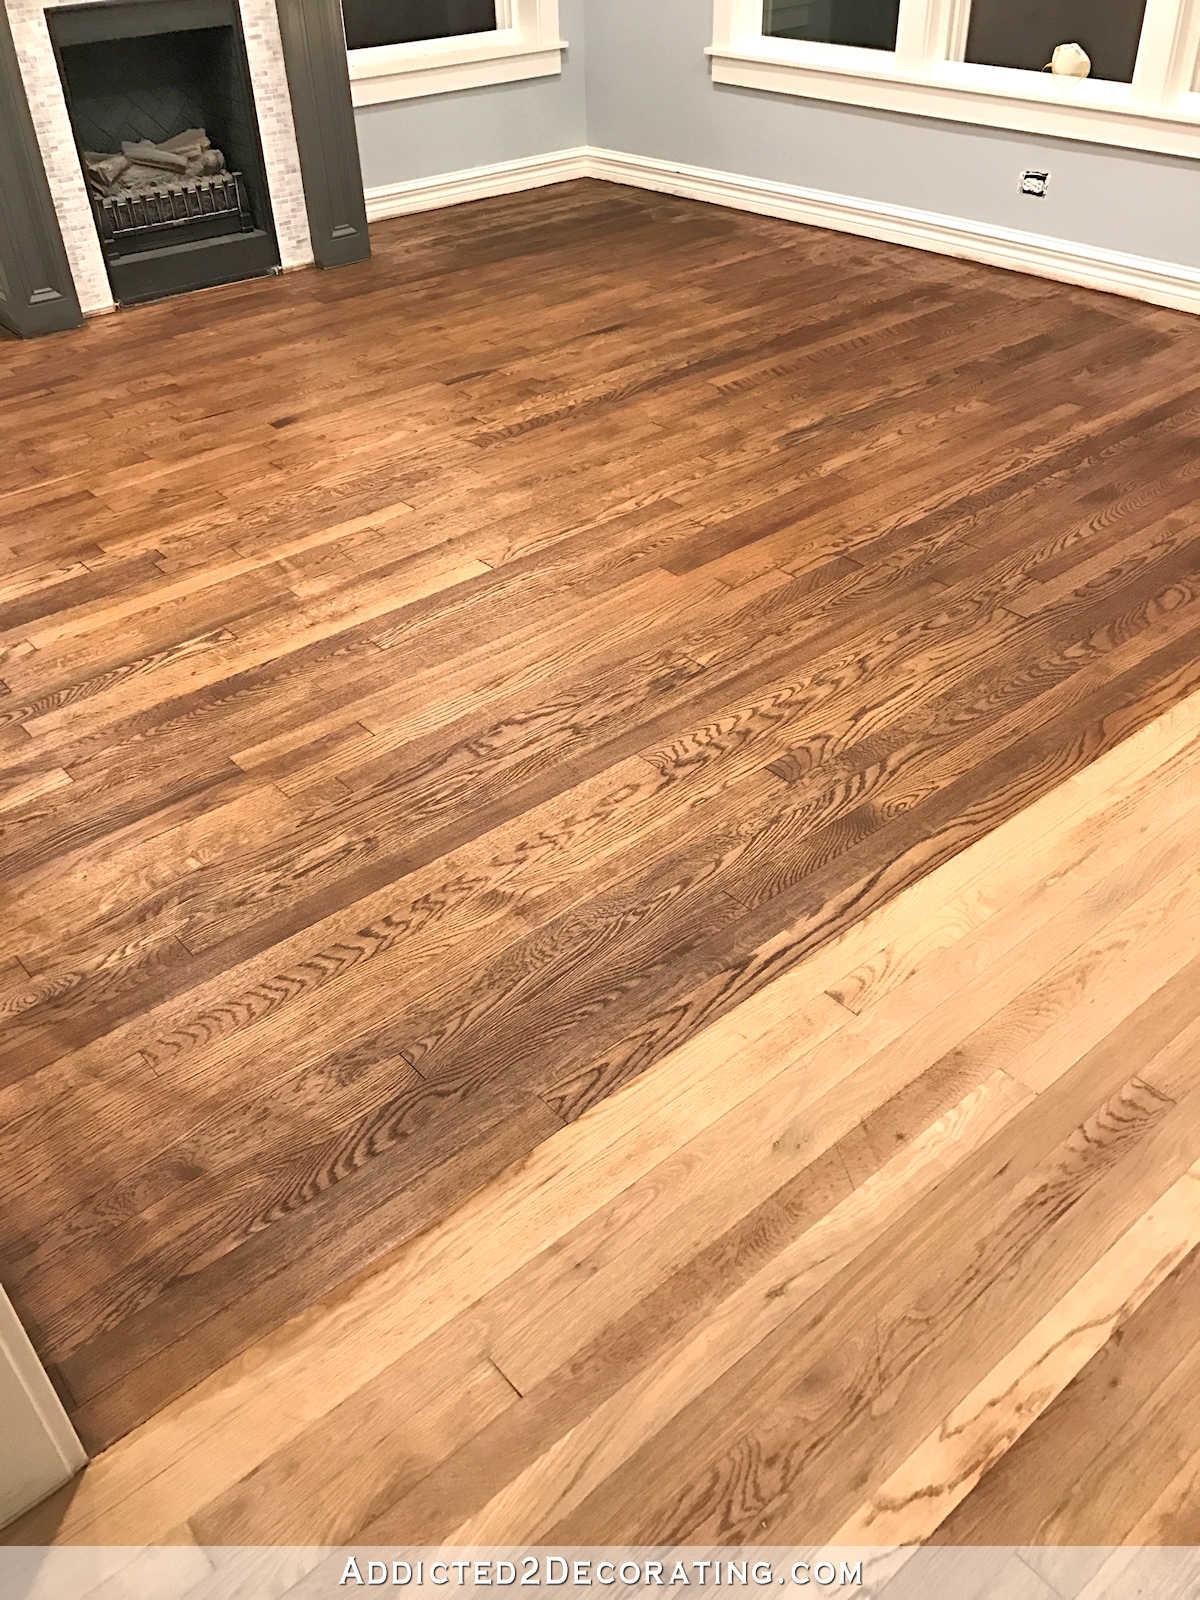 hardwood floor refinishing colors of adventures in staining my red oak hardwood floors products process regarding staining red oak hardwood floors 7 stain on the living room floor